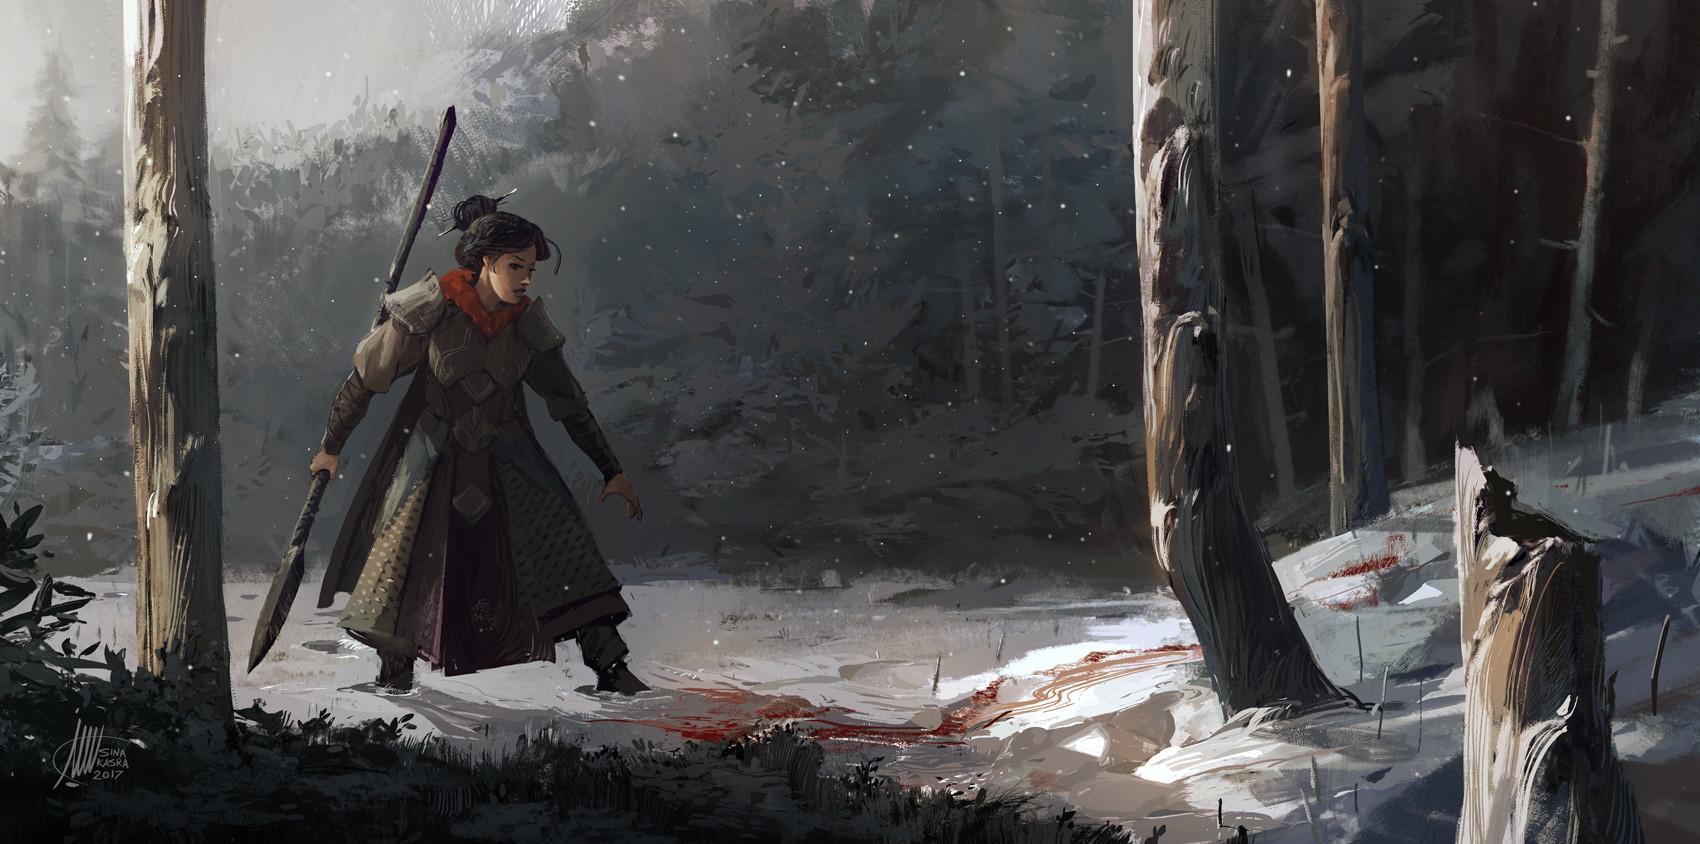 Sina pakzx kasra the pursuit of the forgotten knight 2